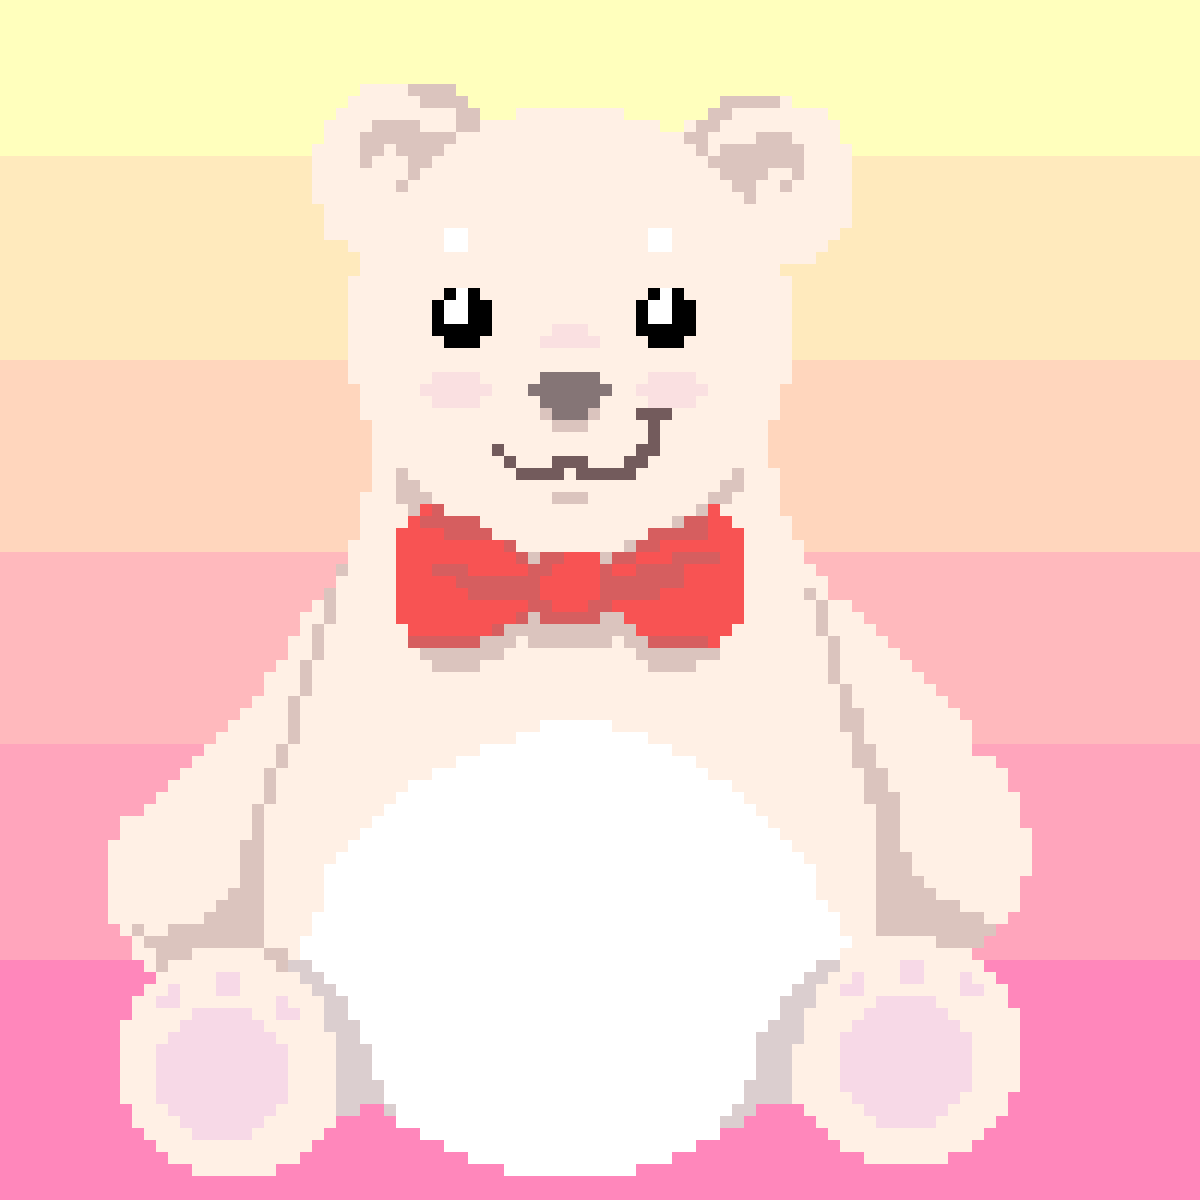 Hay Hay Chicken Stuffed Animal, Pixilart Big Fluffy Teddy Bear By Nellecfox